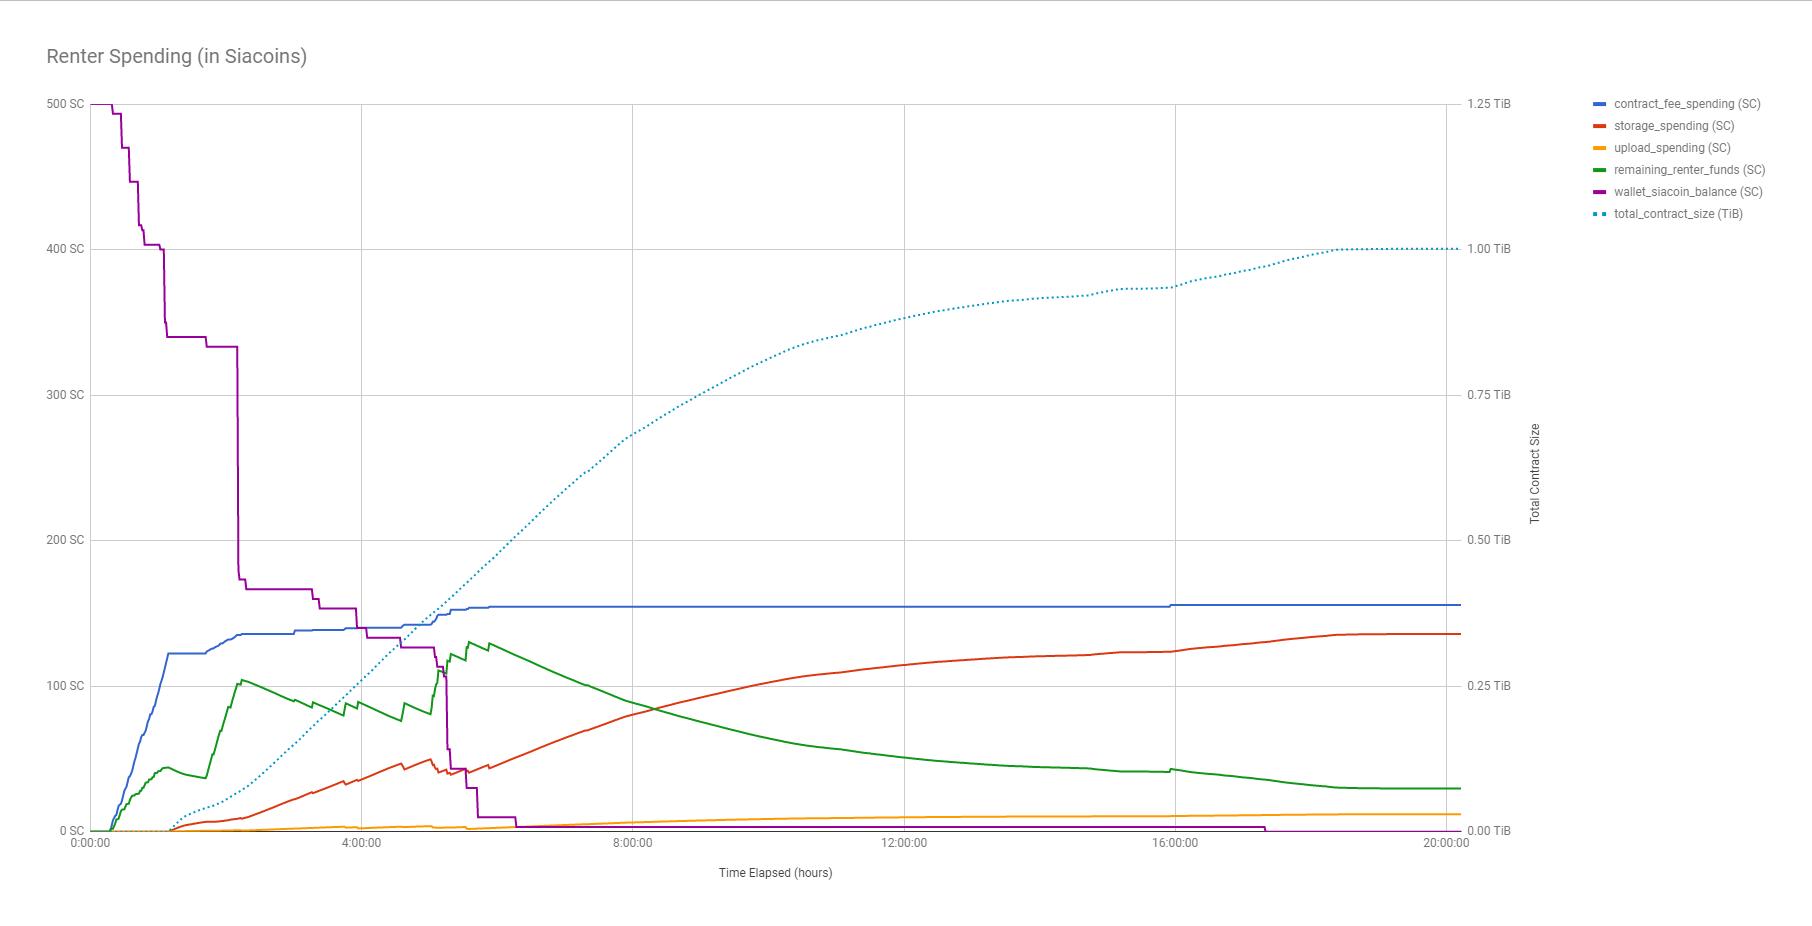 Chart of renter spending over time